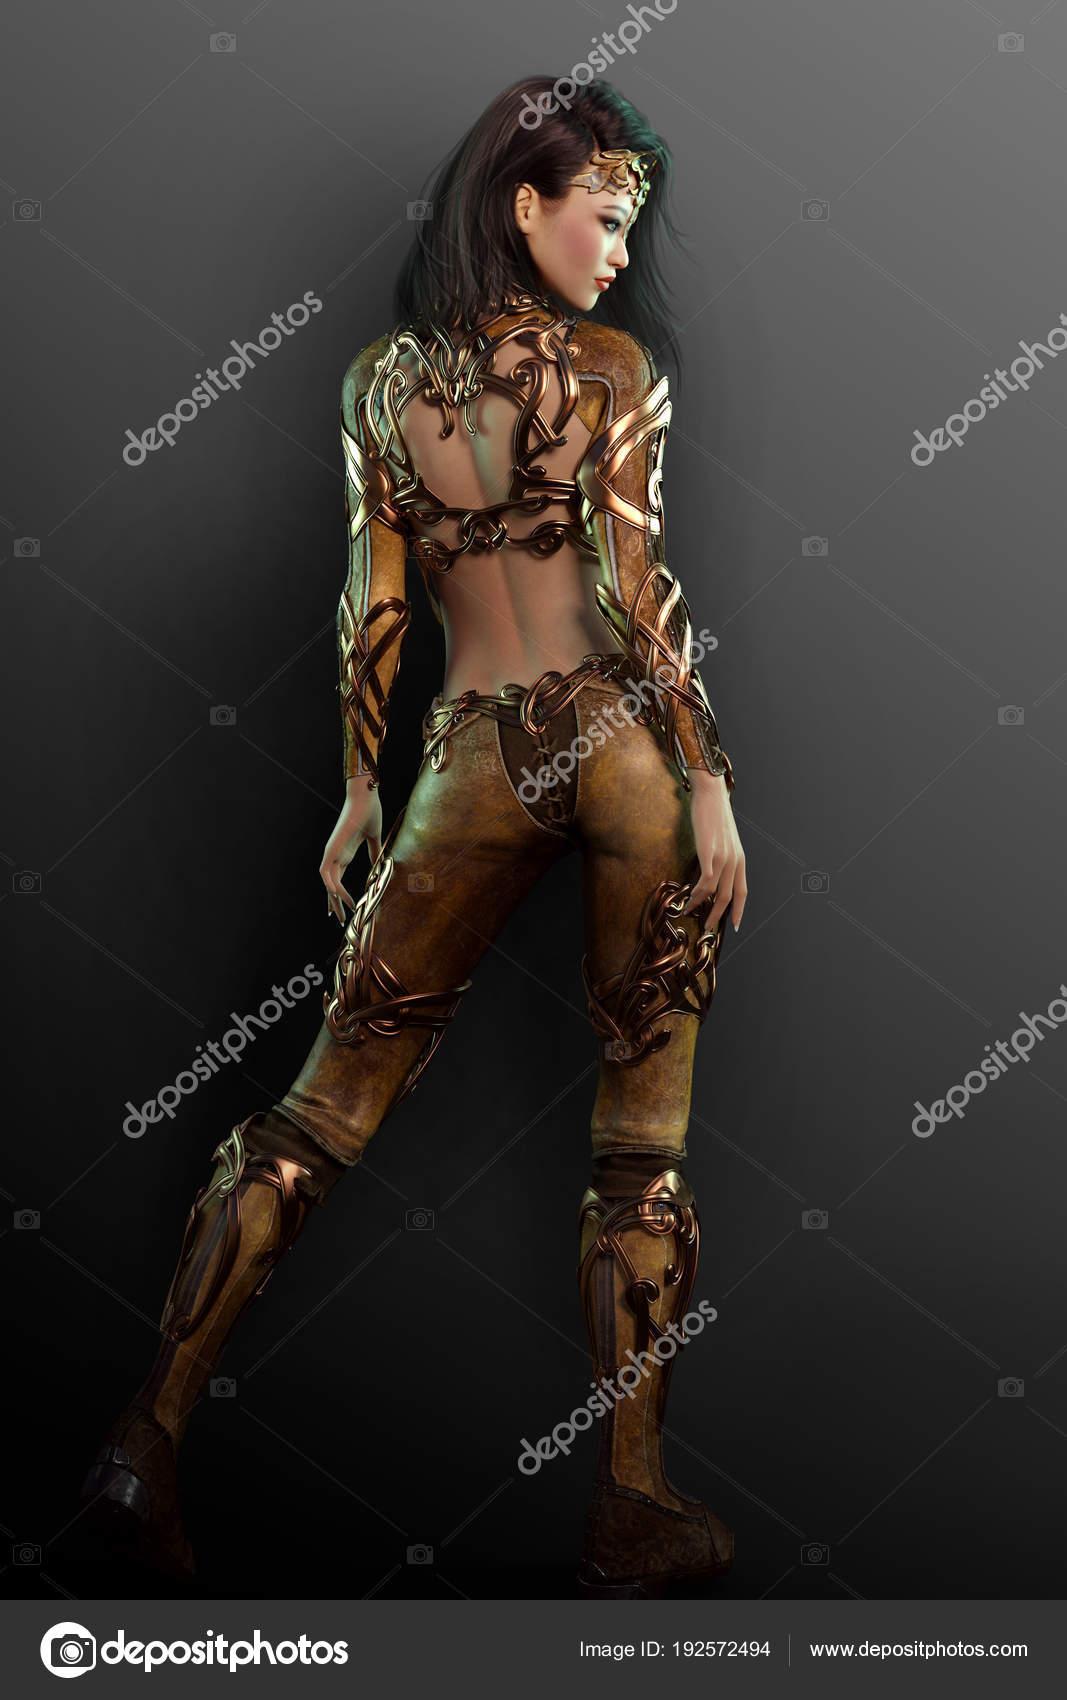 Erotic fantasy armor pics 756